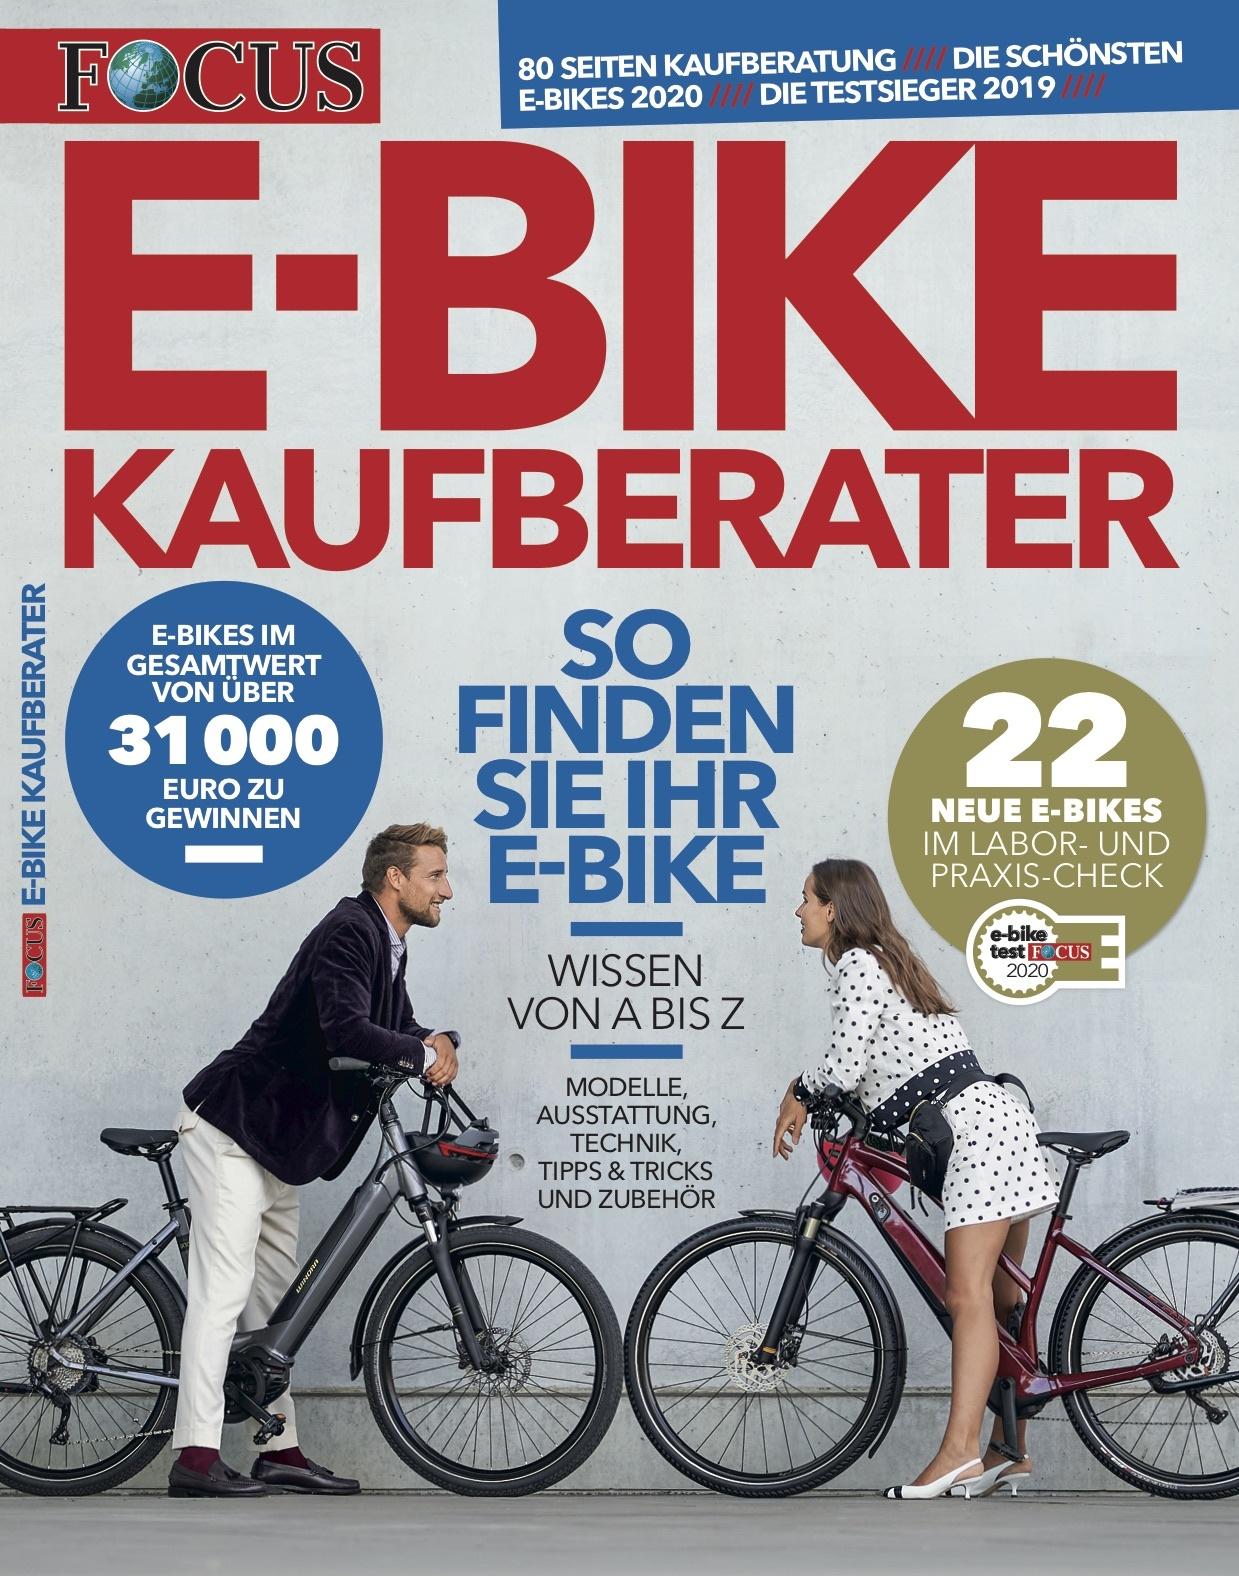 FOCUS E-Bike 01/2020  - Kaufberater